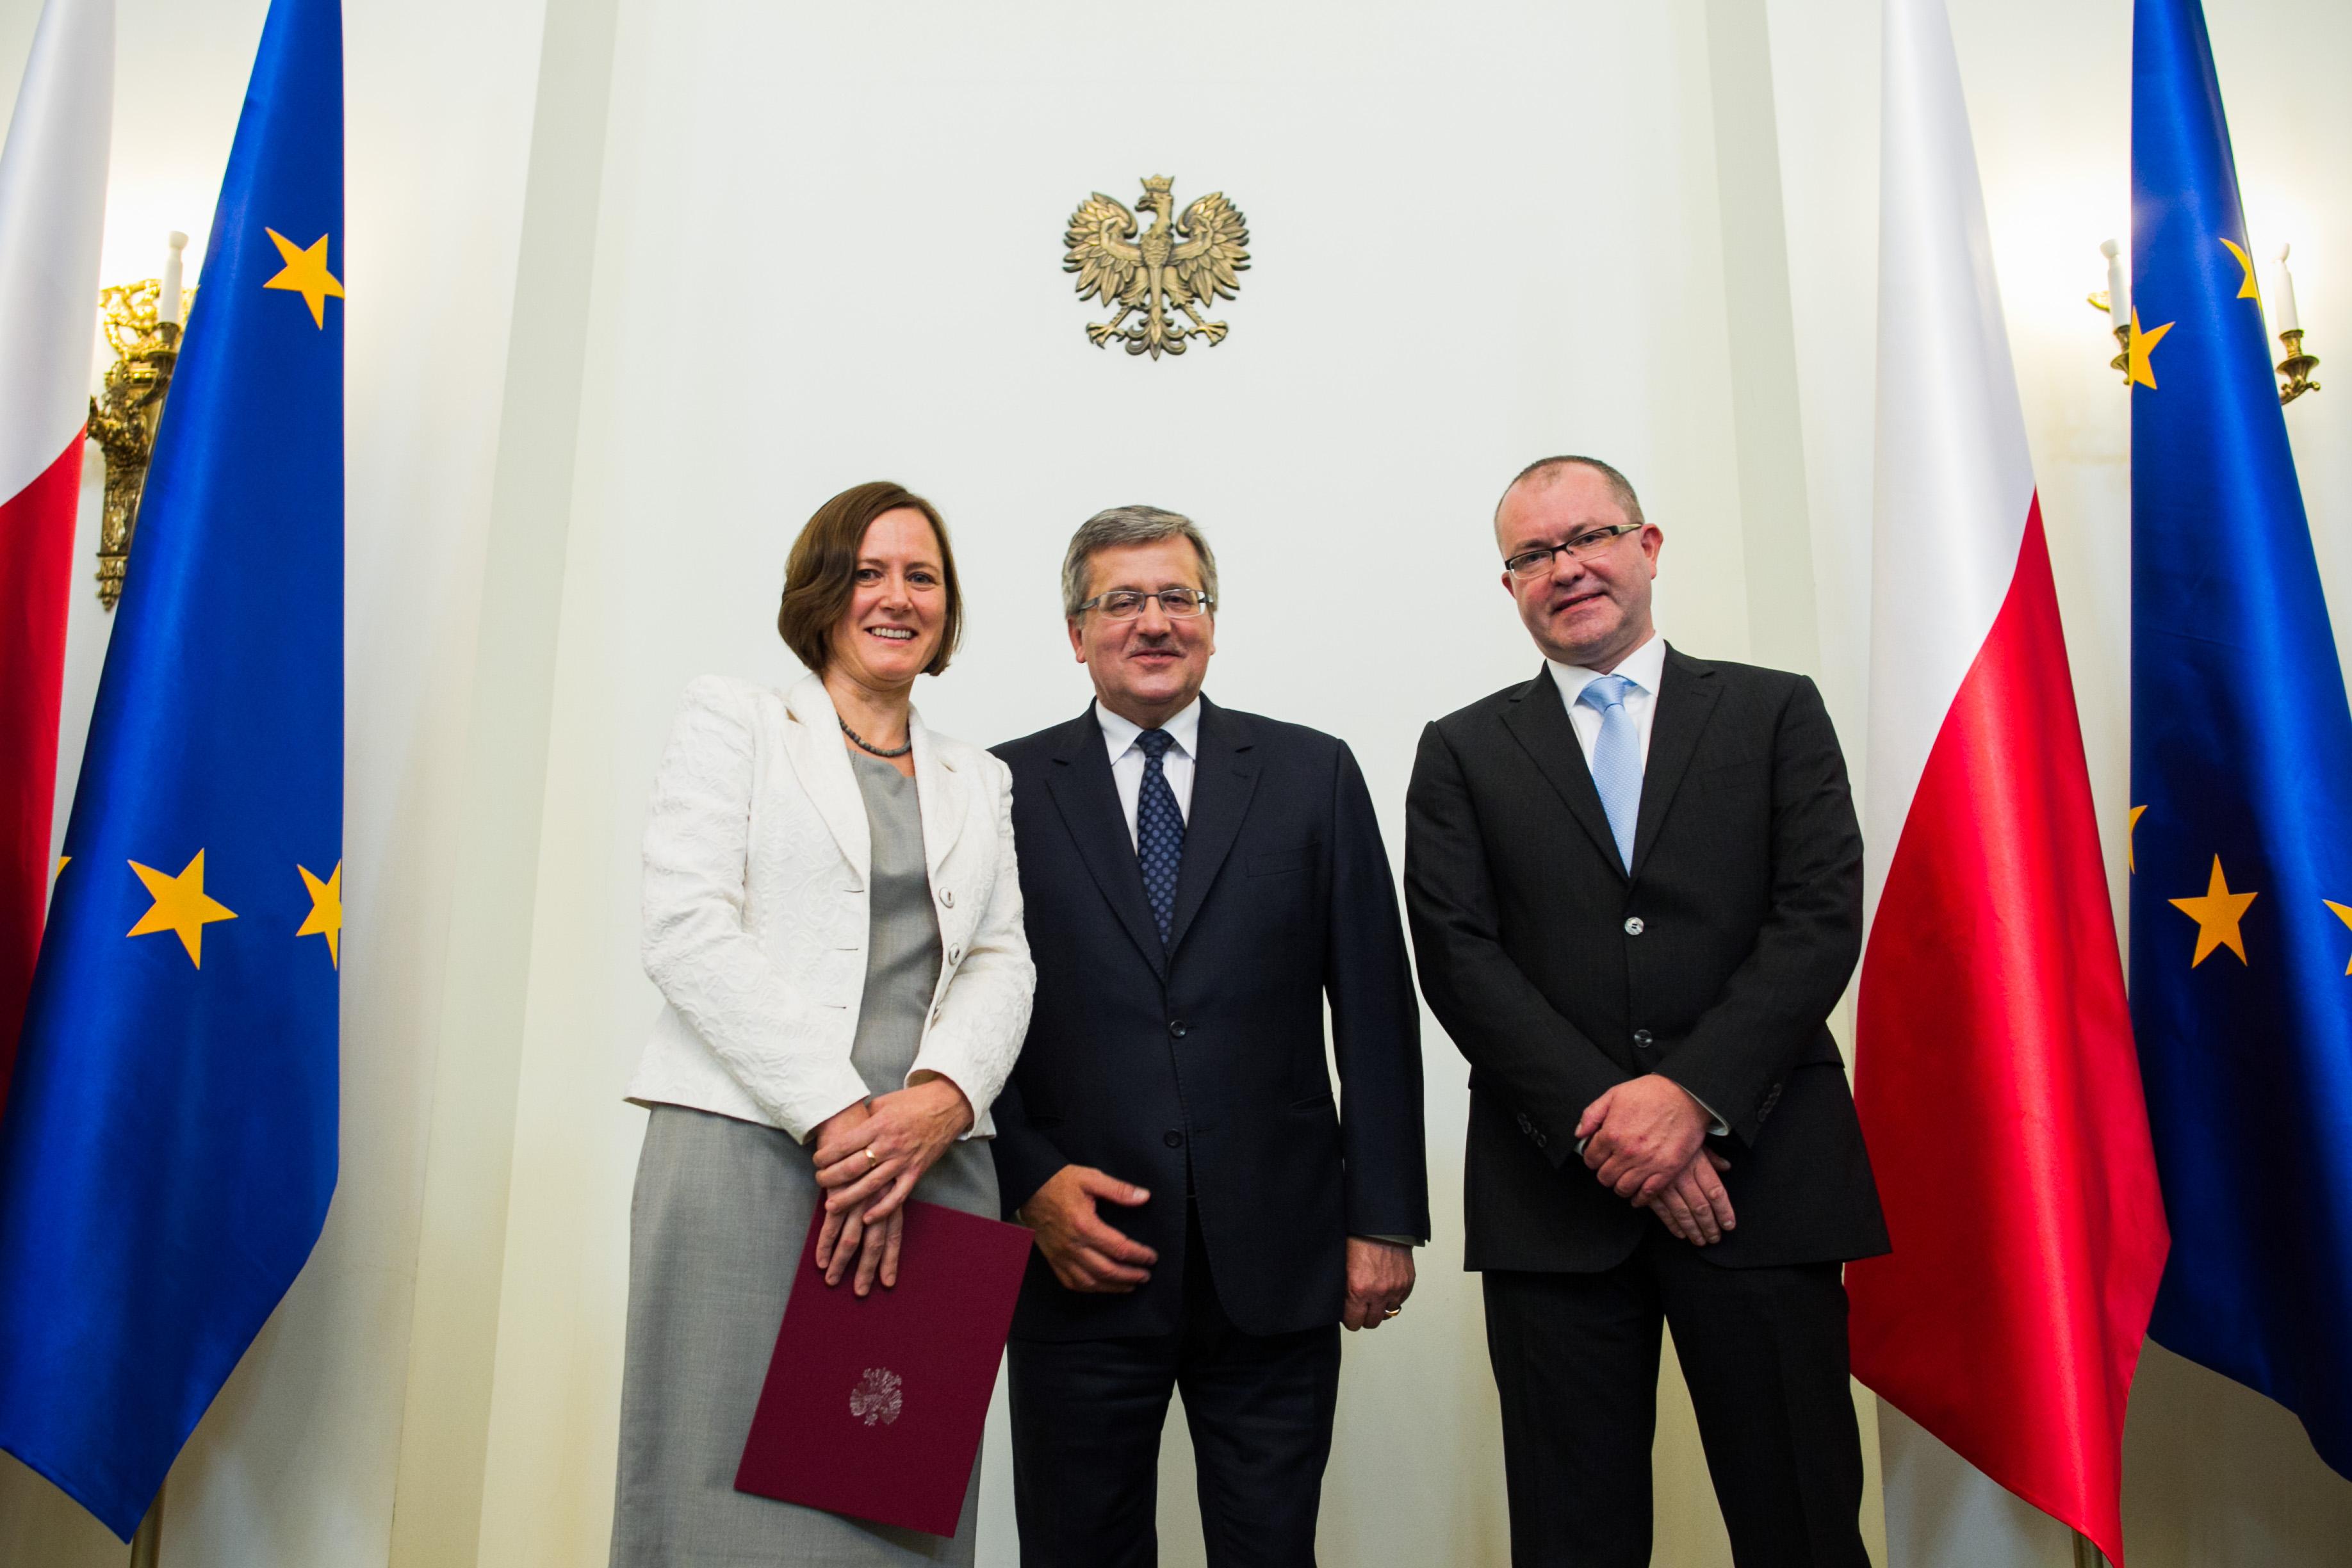 Nominacja profesorska dr hab. Magdy Zaułuskiej-Kotur 2